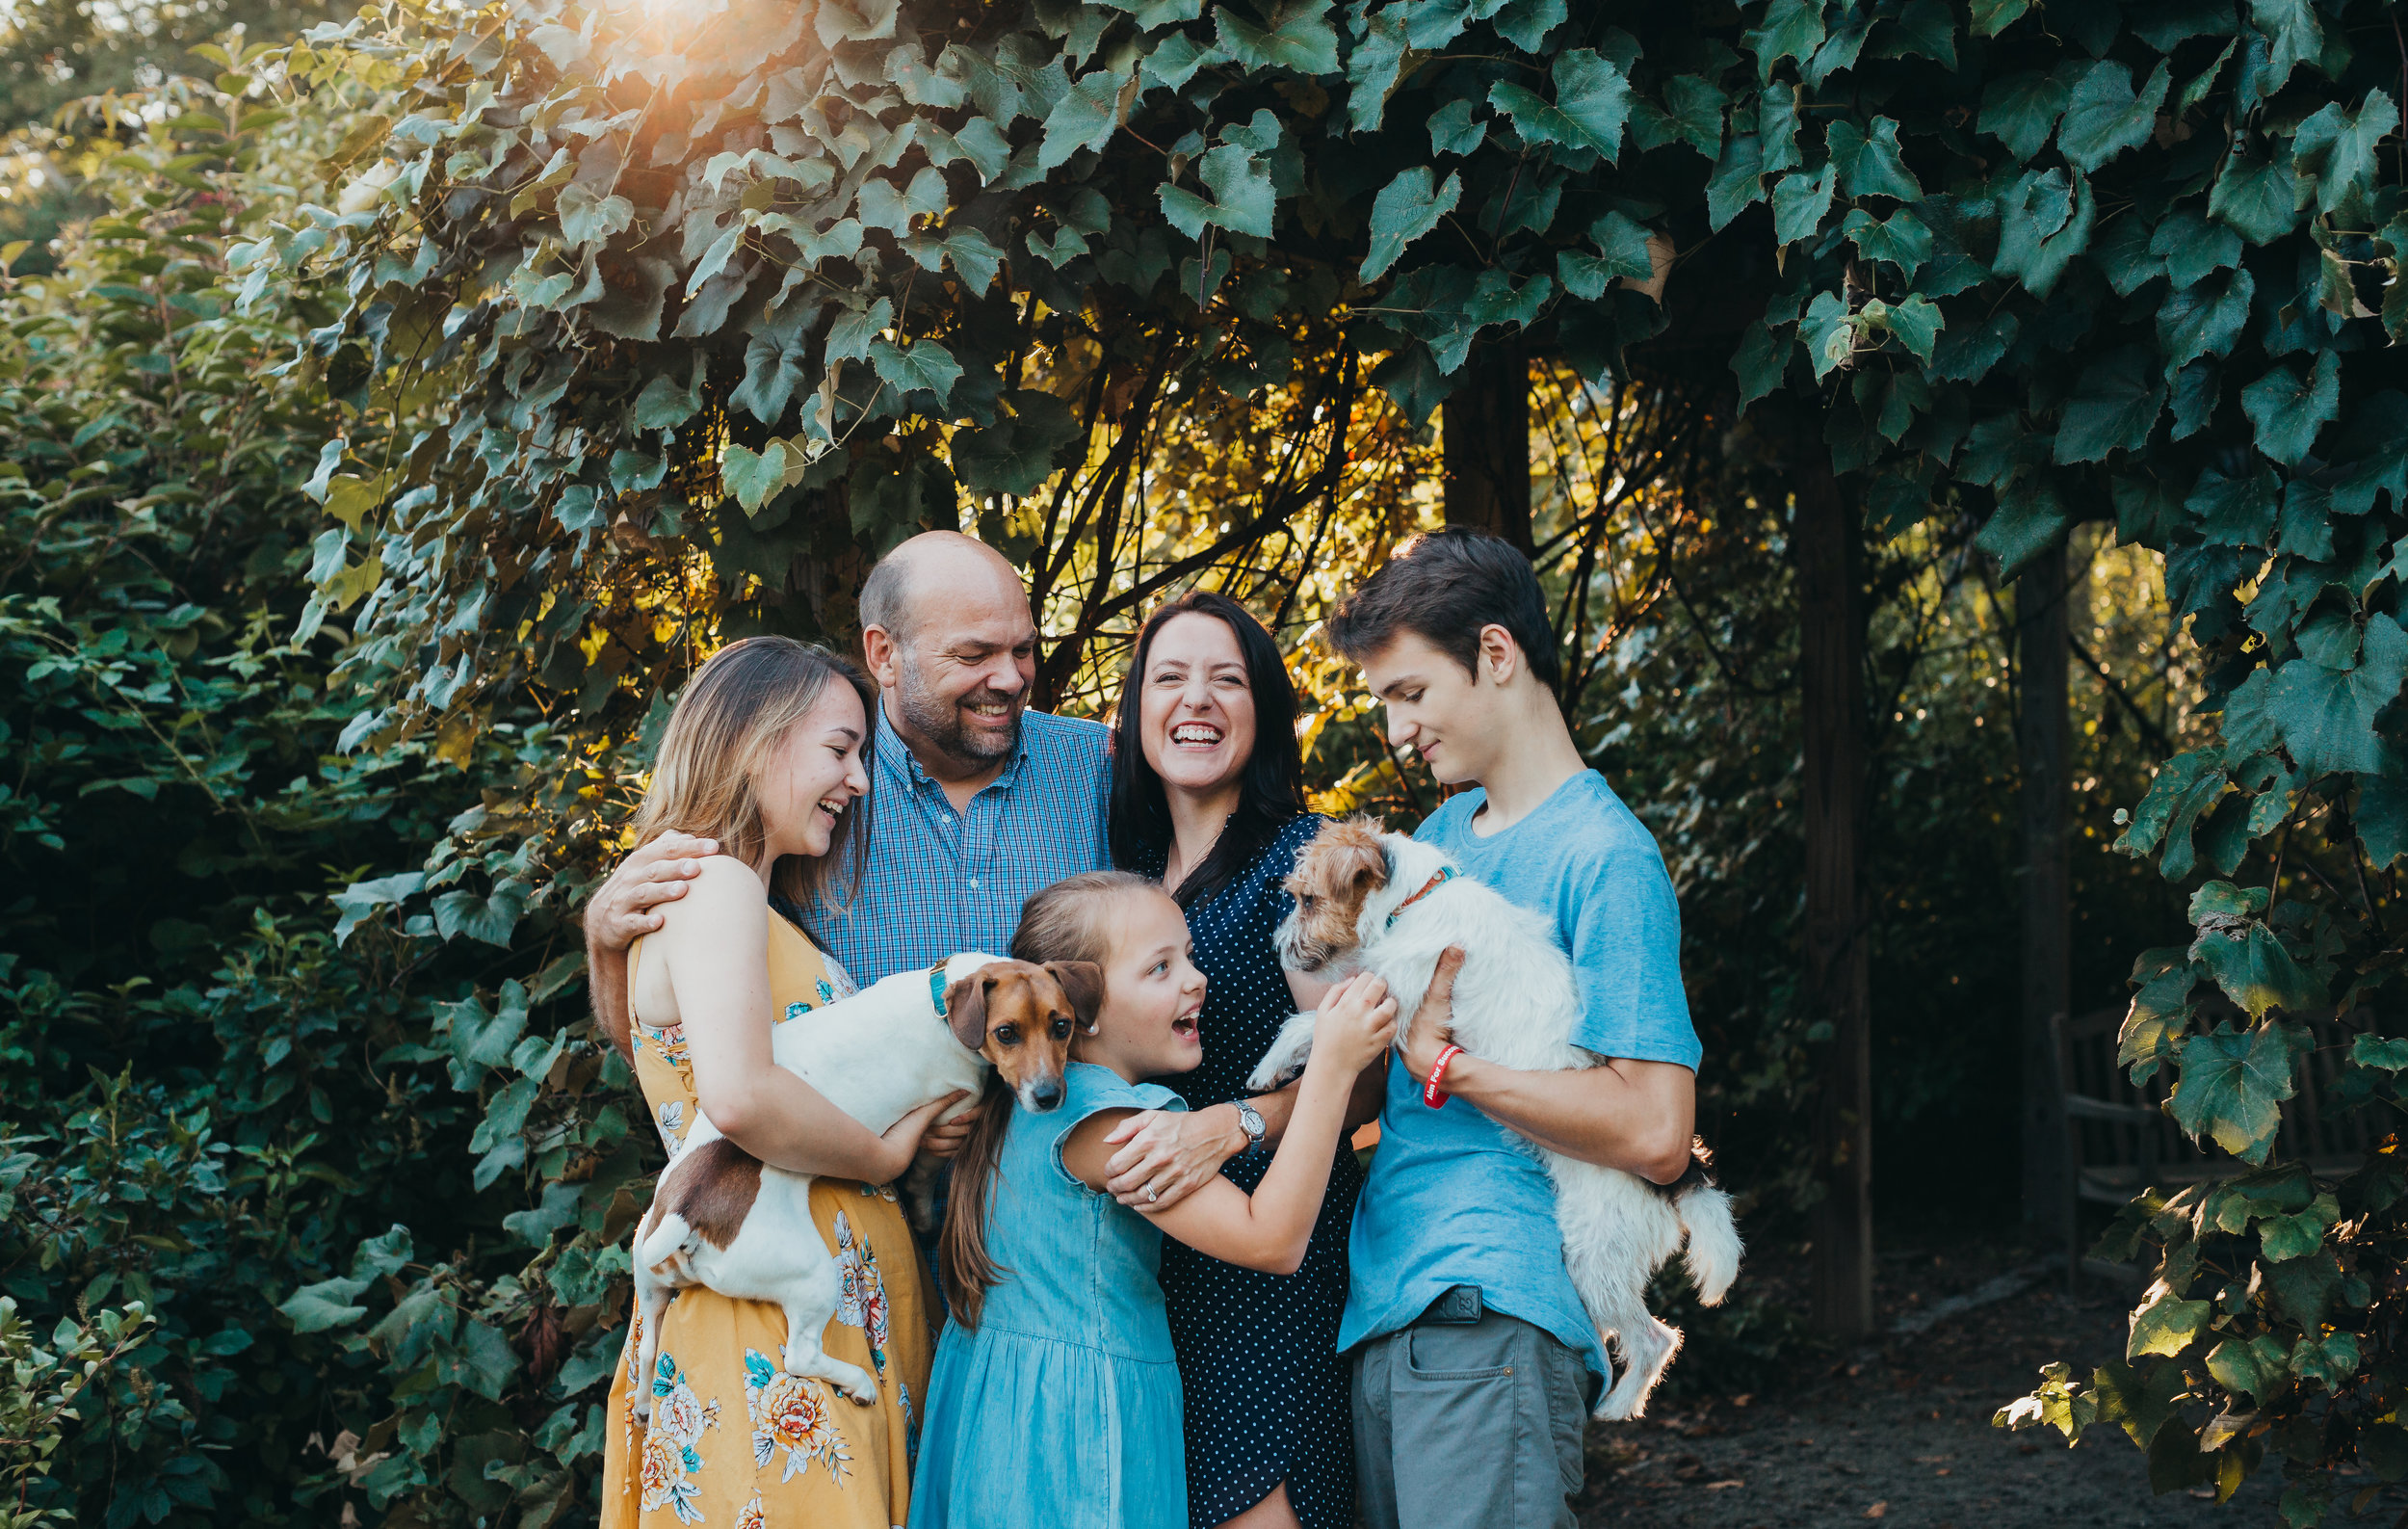 what-to-wear-family-photos-coordinate-dont-match-boston-family-photographer-joy-leduc.jpg